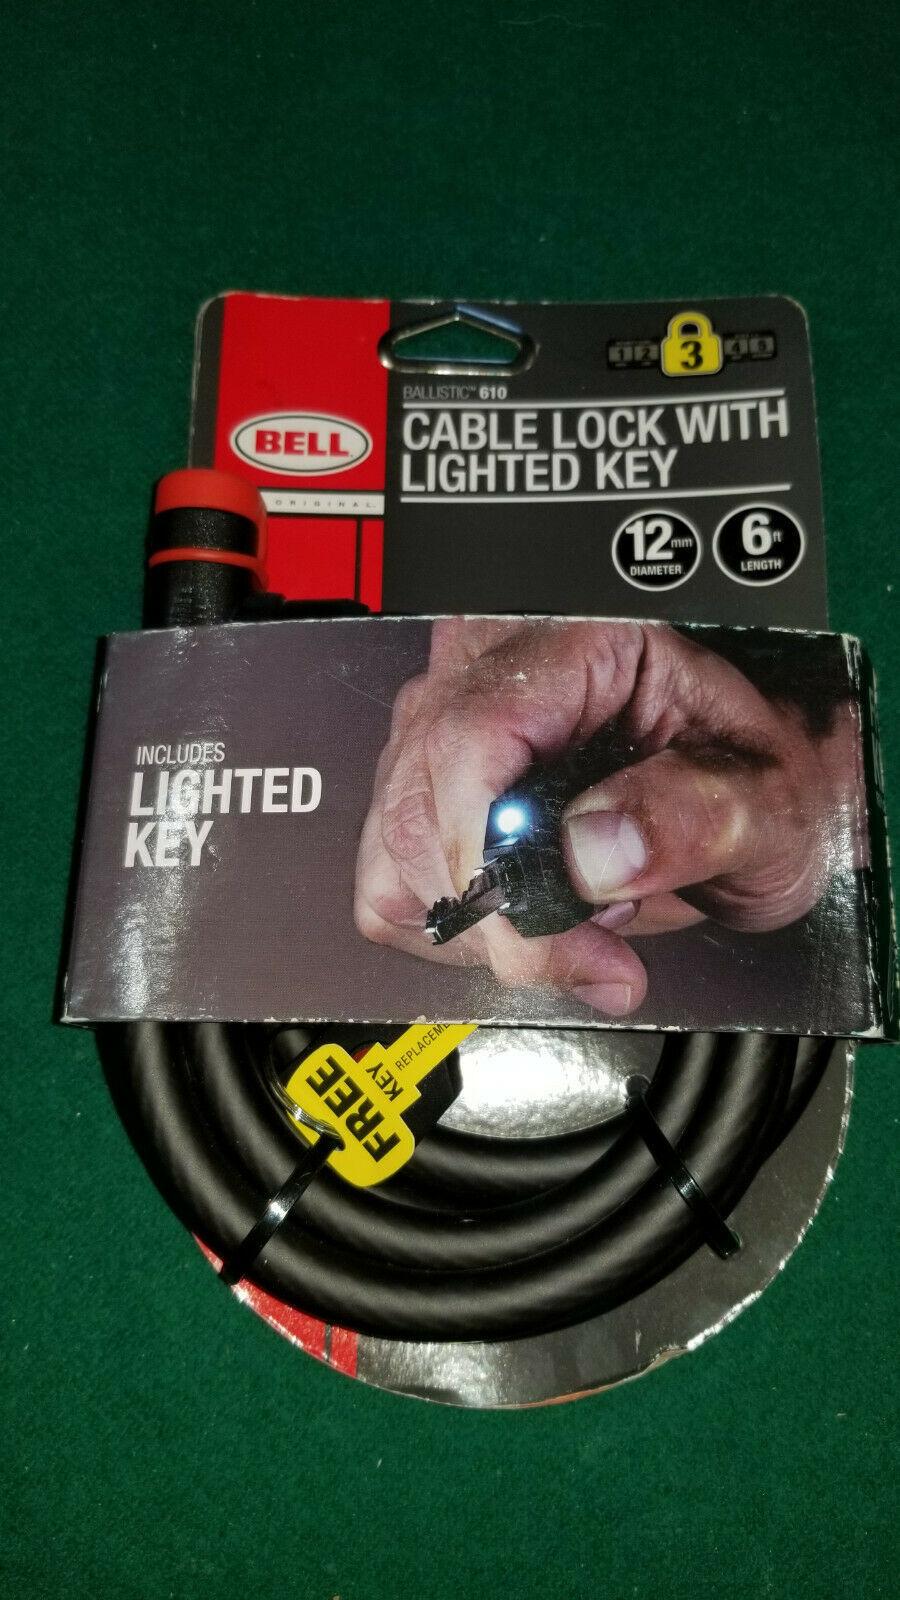 NEW BELL BALLISTIC CABLE BIKE LOCK 600 SECURE HD STEEL LIGHTED KEY 12MM BLACK - $14.52